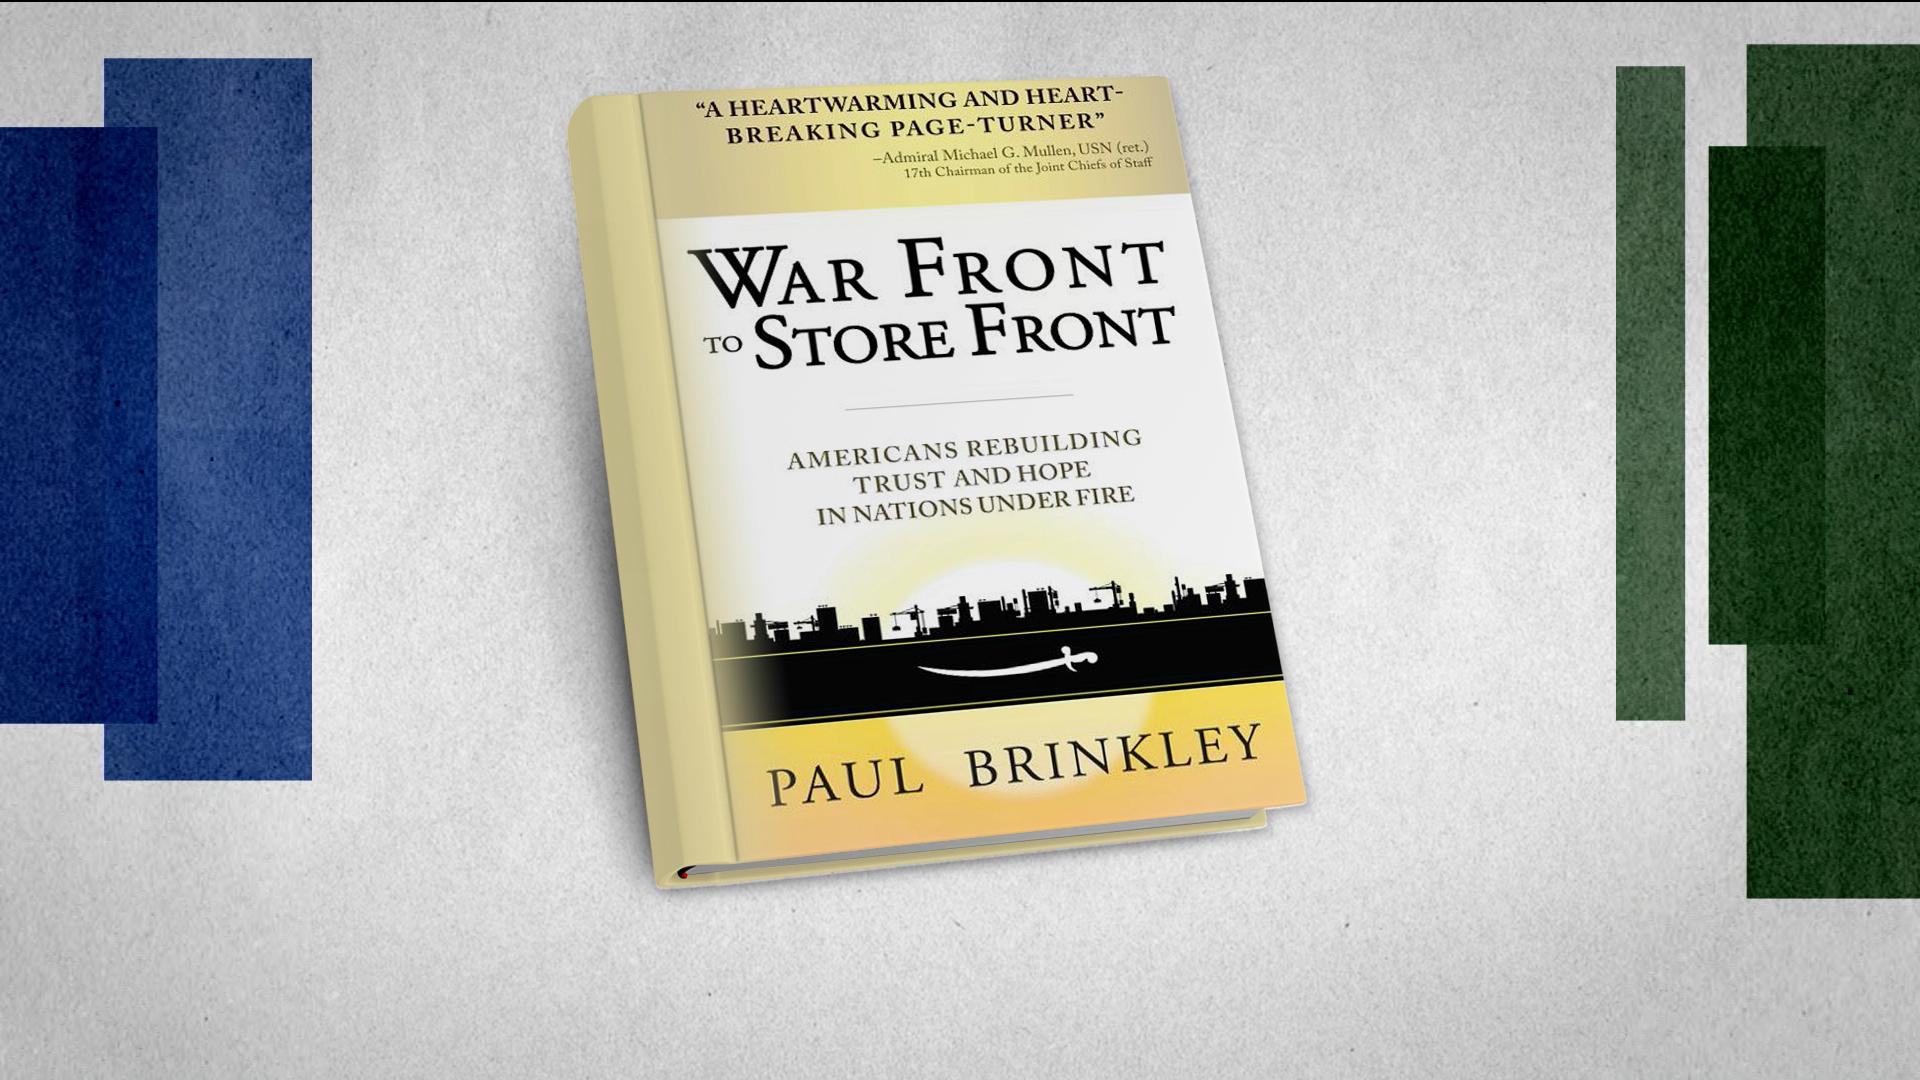 The grave economic impacts of war